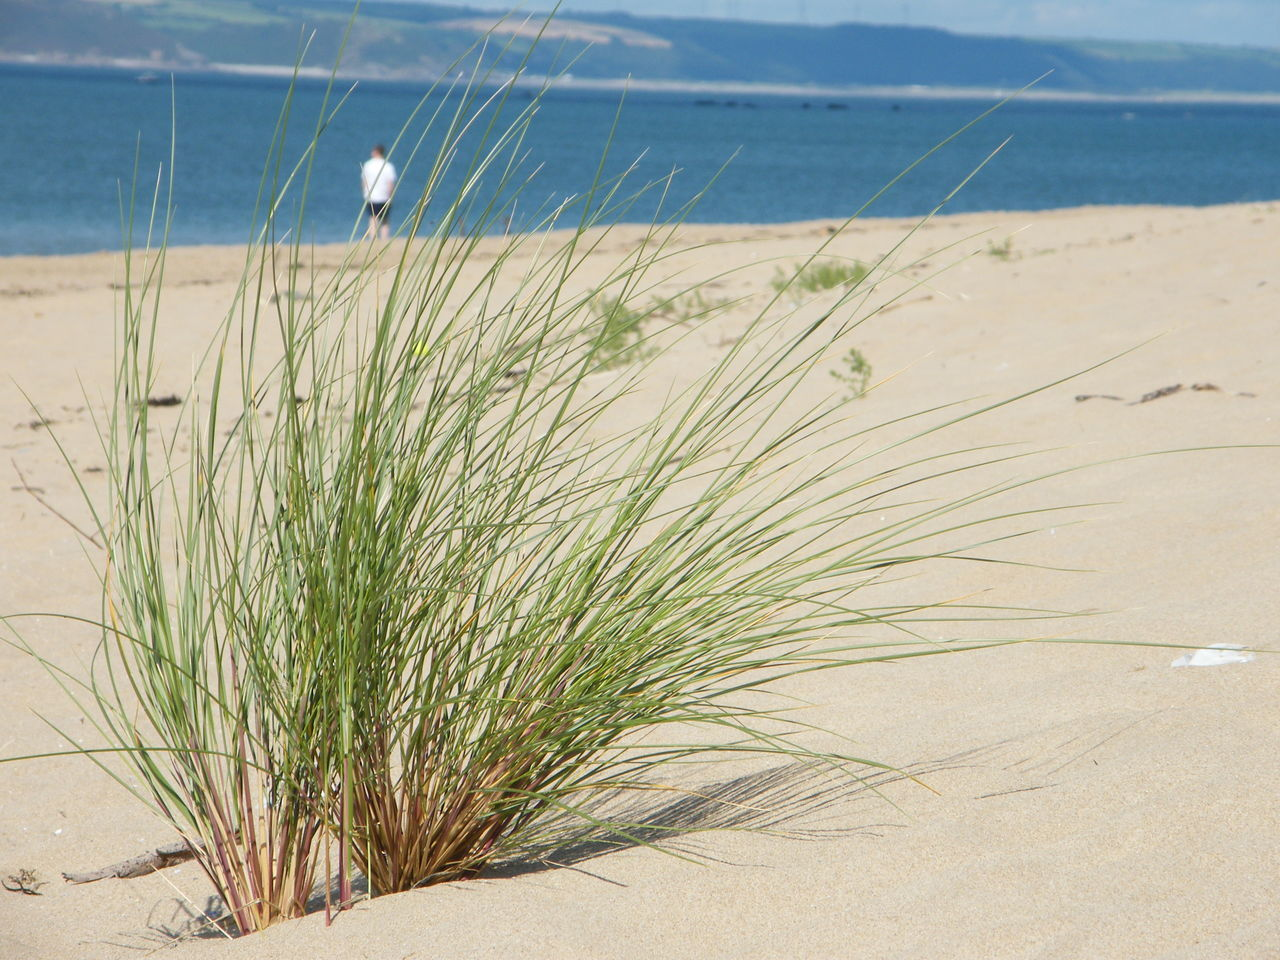 Close-Up Of Plant At Beach